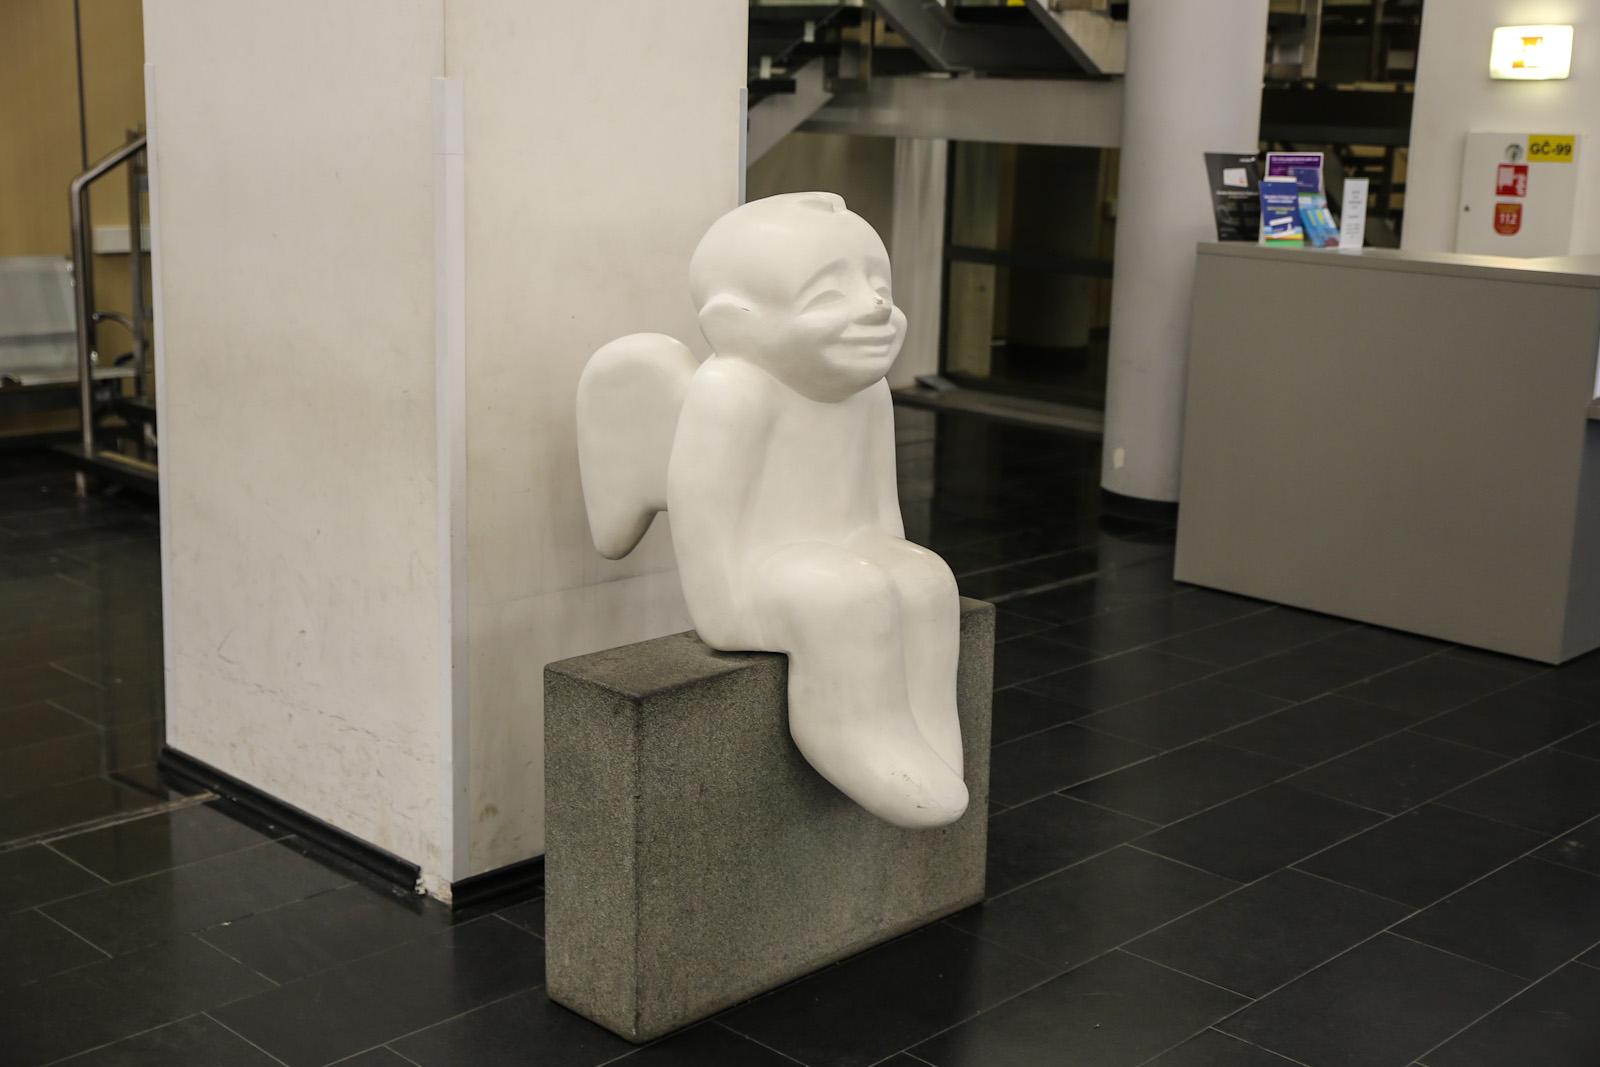 Улыбающийся малыш-ангел в аэропорту Вильнюс